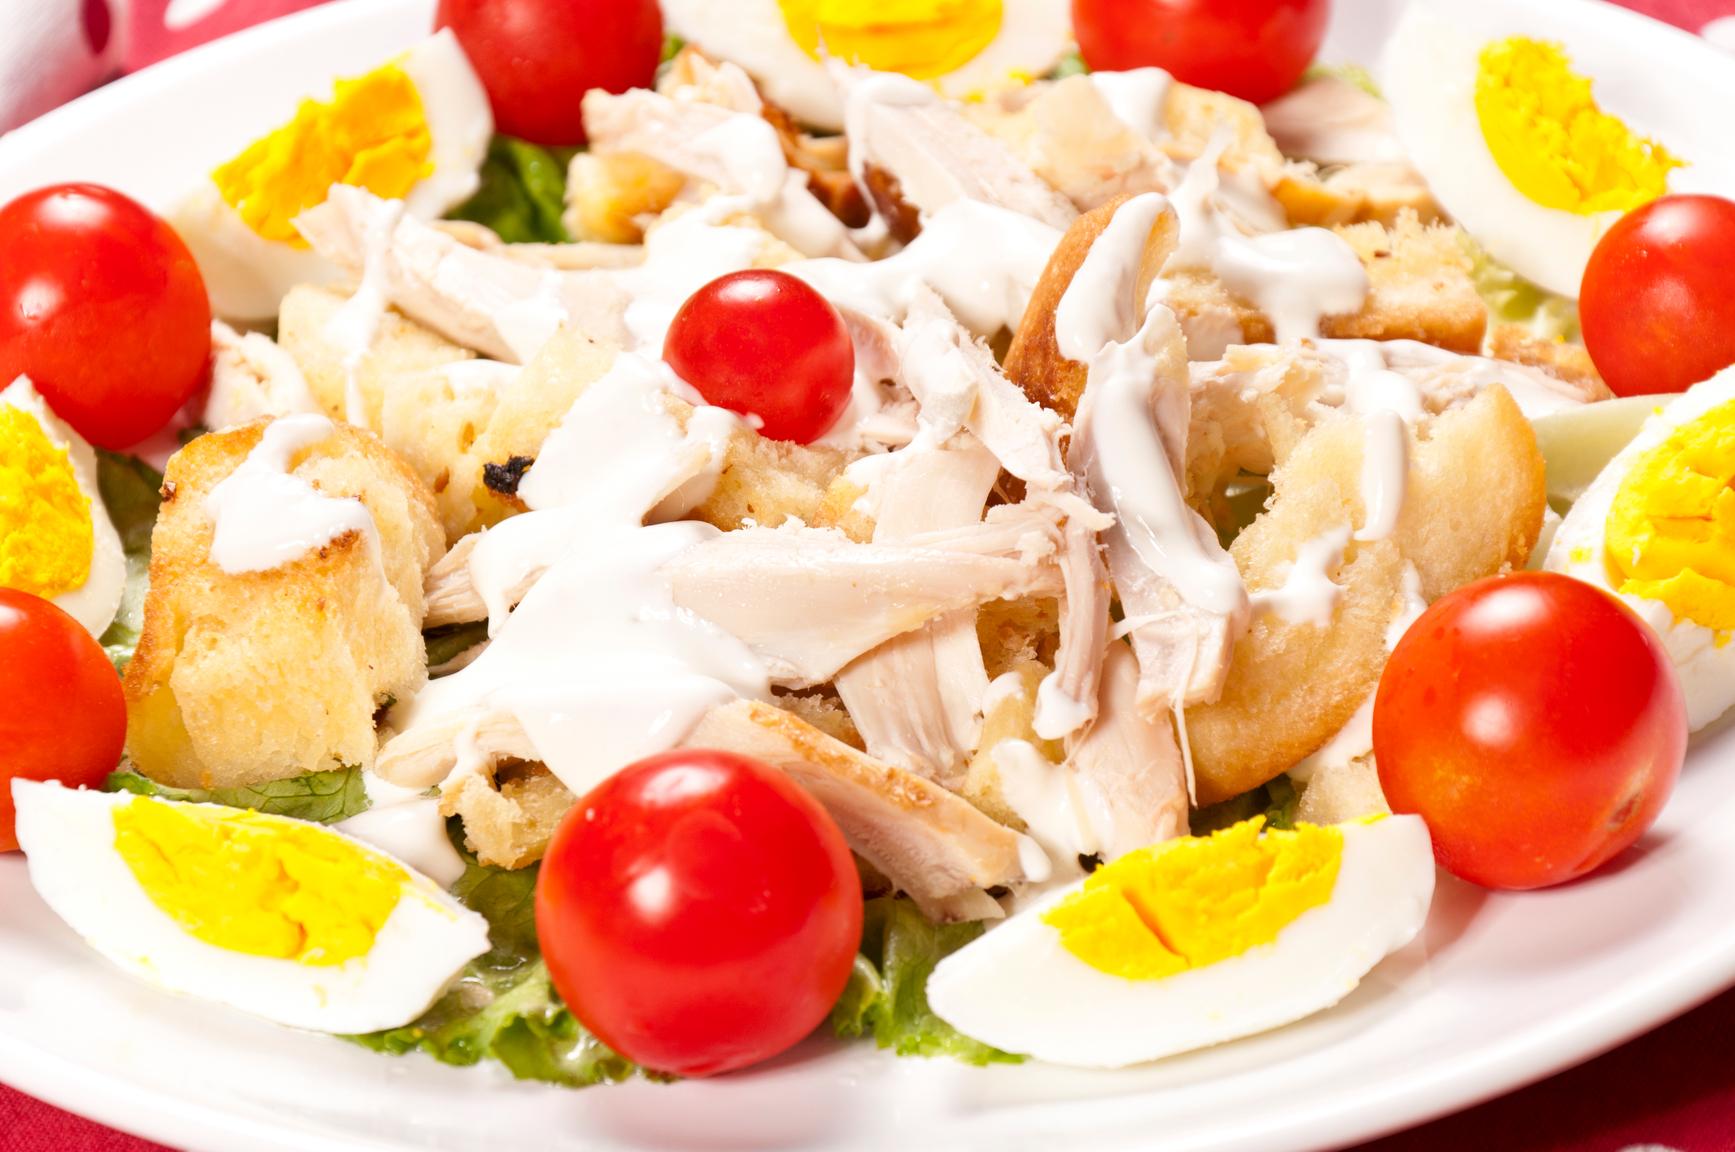 салат лондонский рецепт курица яйца помидоры огурцы